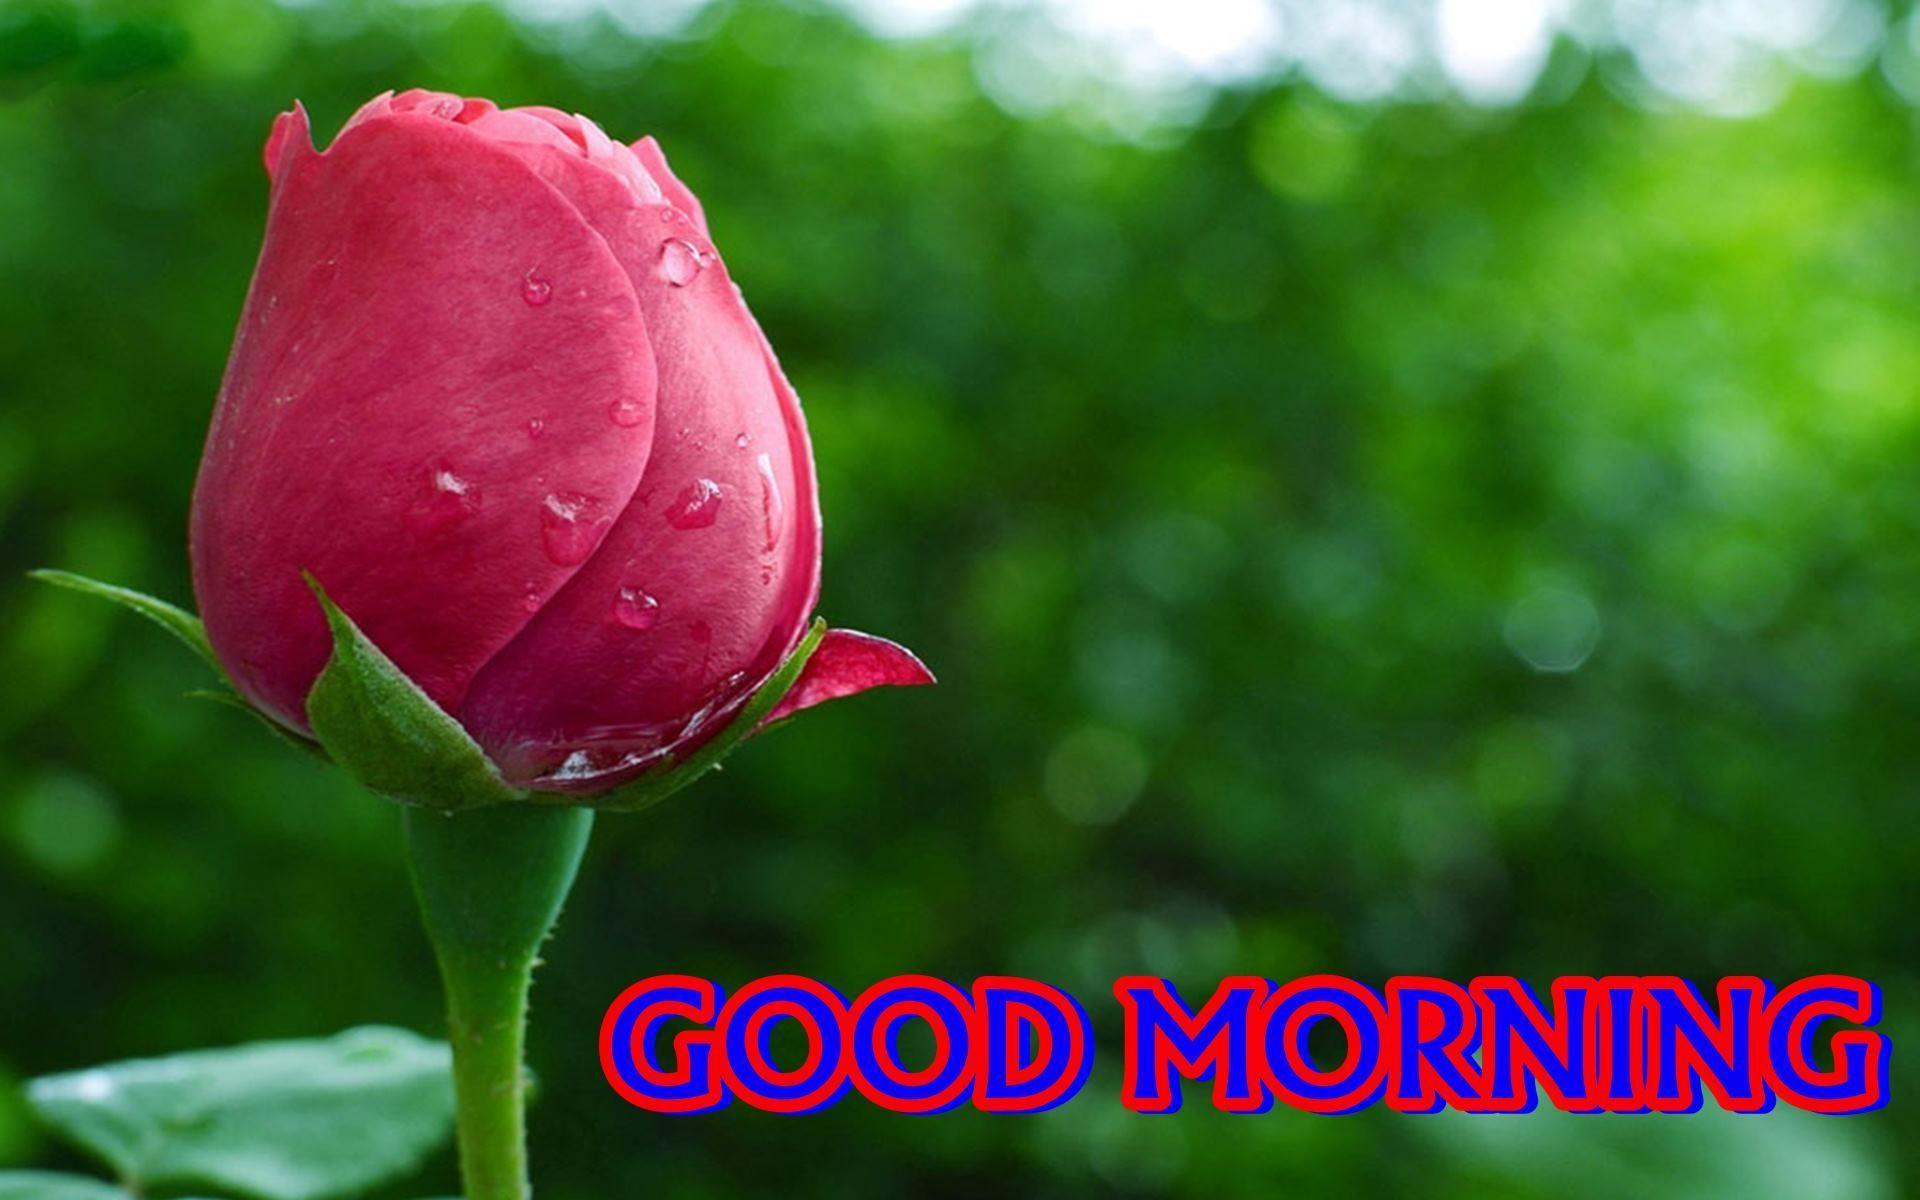 Morning Desktop Wallpapers Top Free Morning Desktop Backgrounds Wallpaperaccess